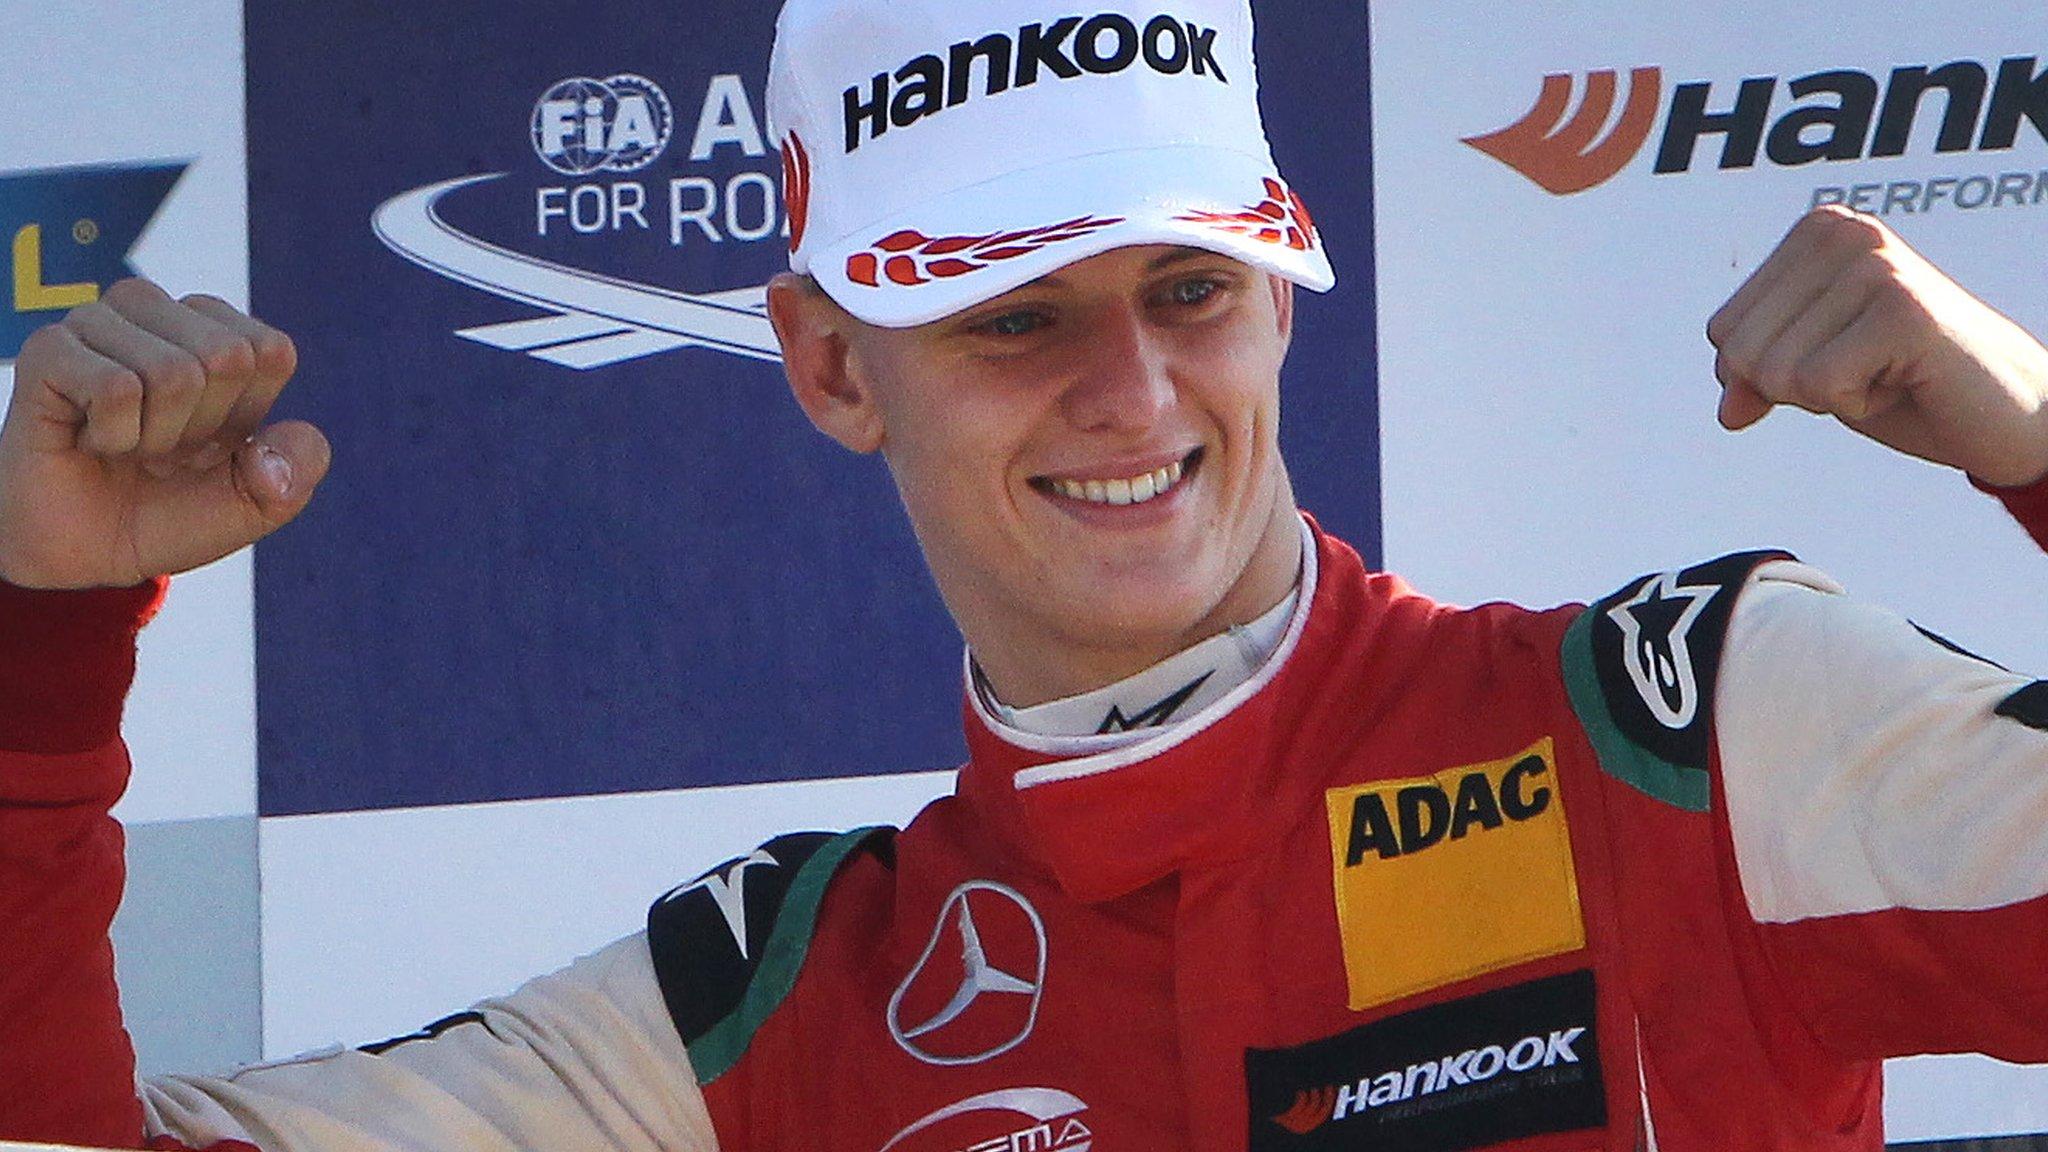 Schumacher Jr wins Ferrari place 'for his talent'